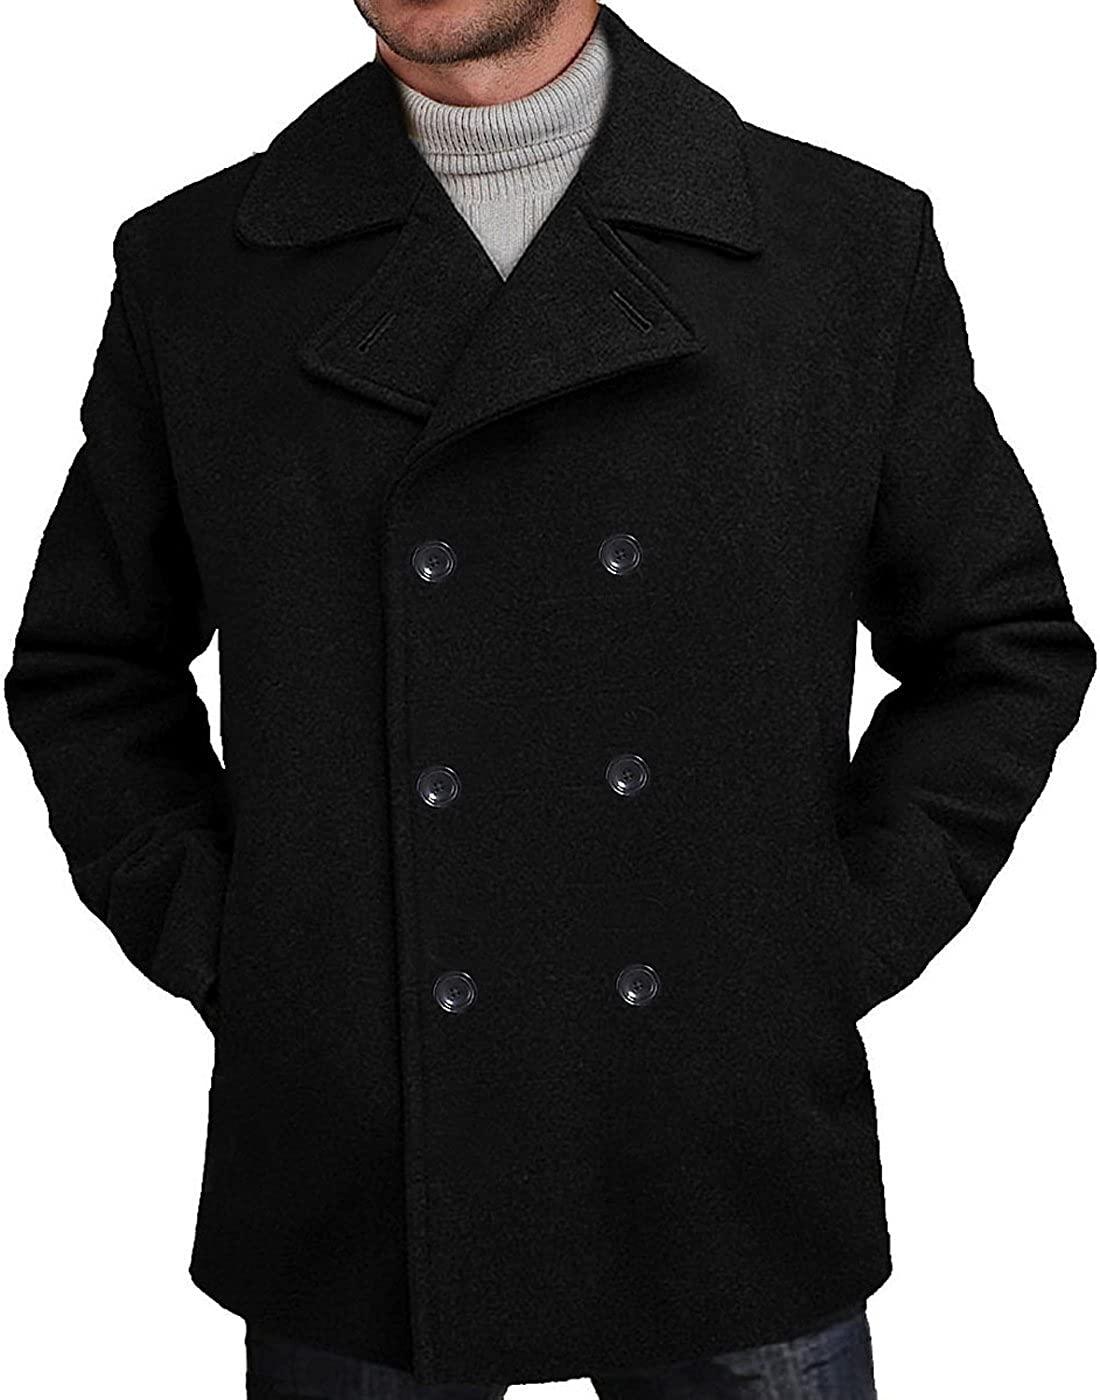 BGSD Men's Classic Wool Blend Pea Coat